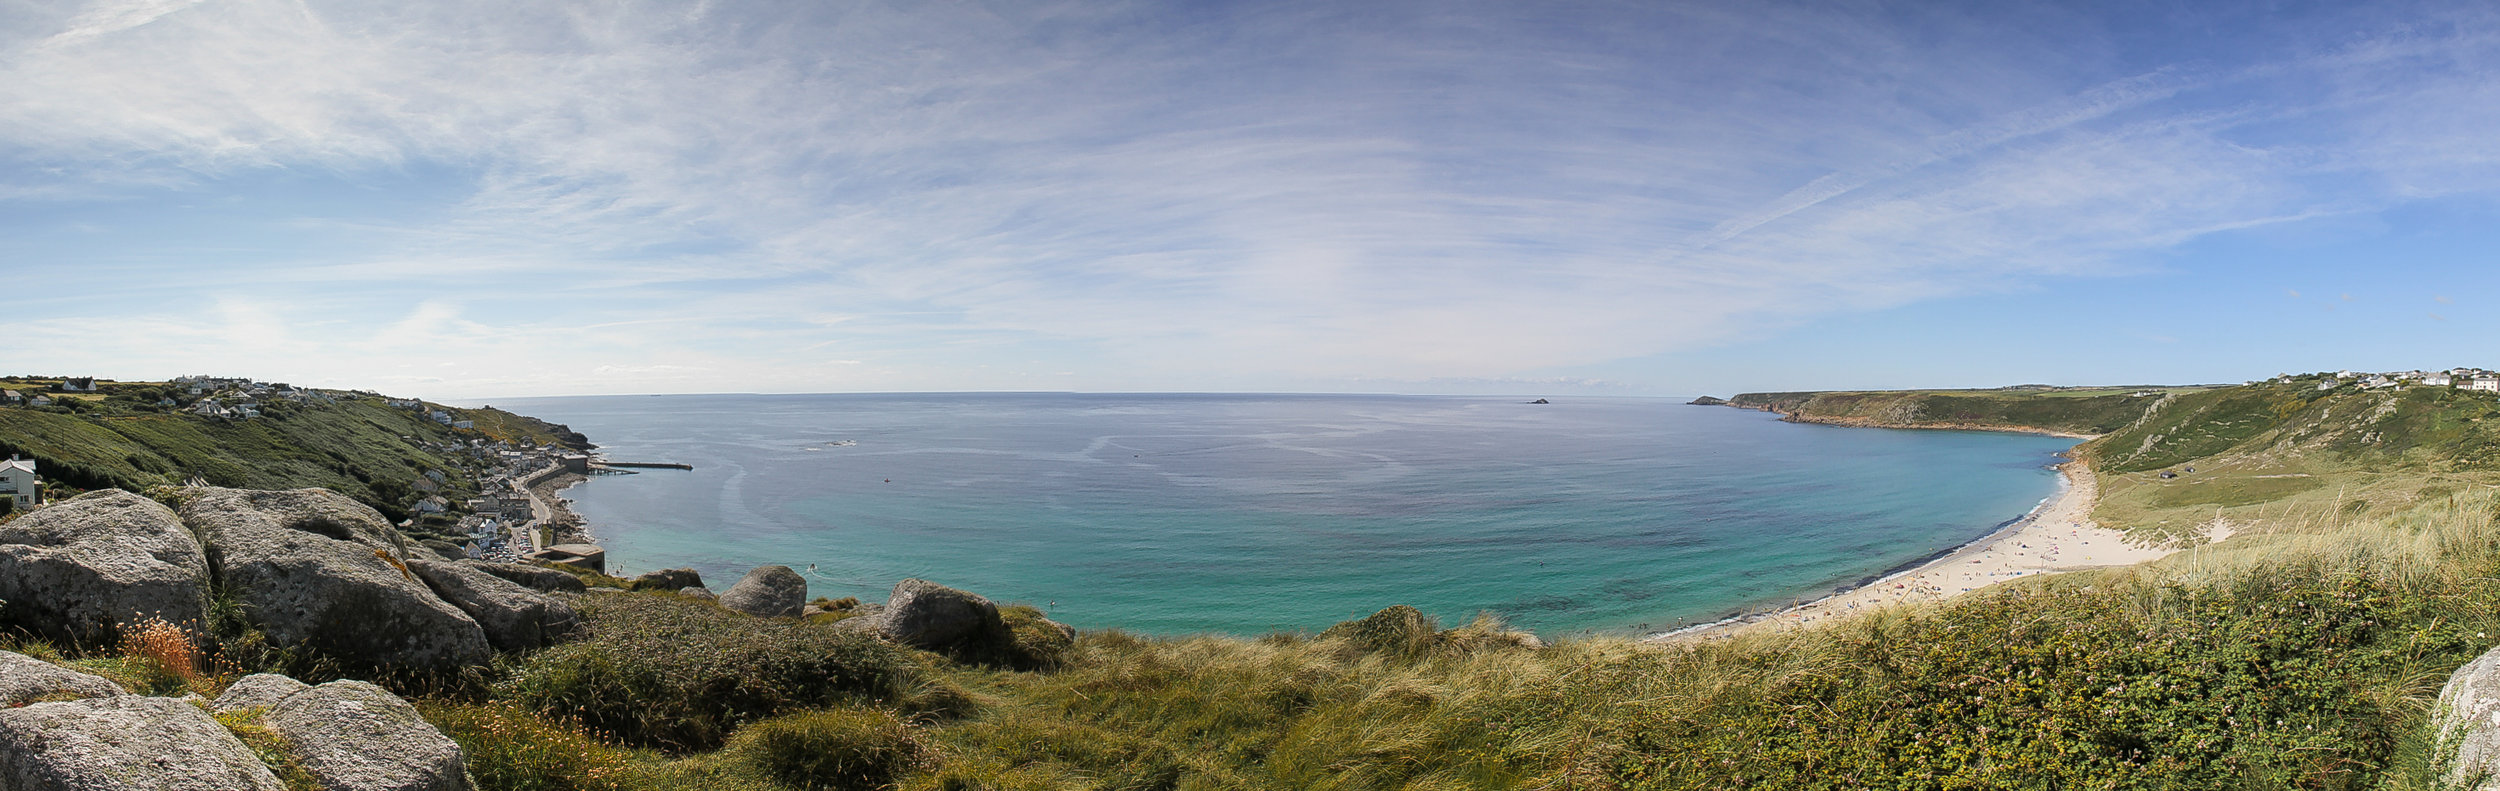 Panorama raw 1.jpg